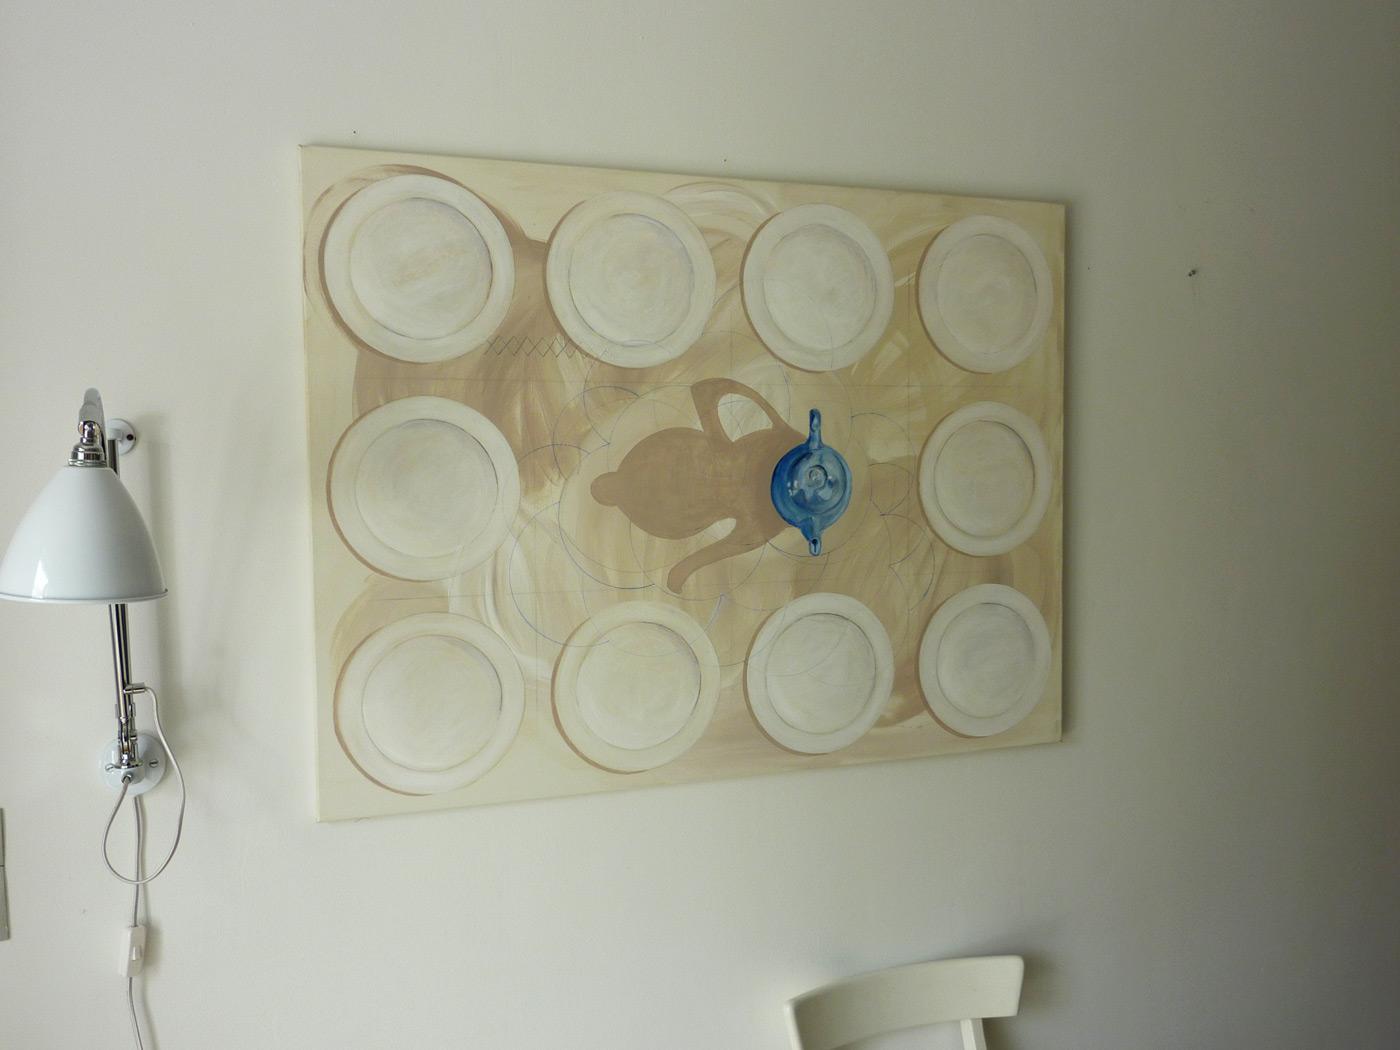 Modern art gallery, best online art, paintings, household interior design